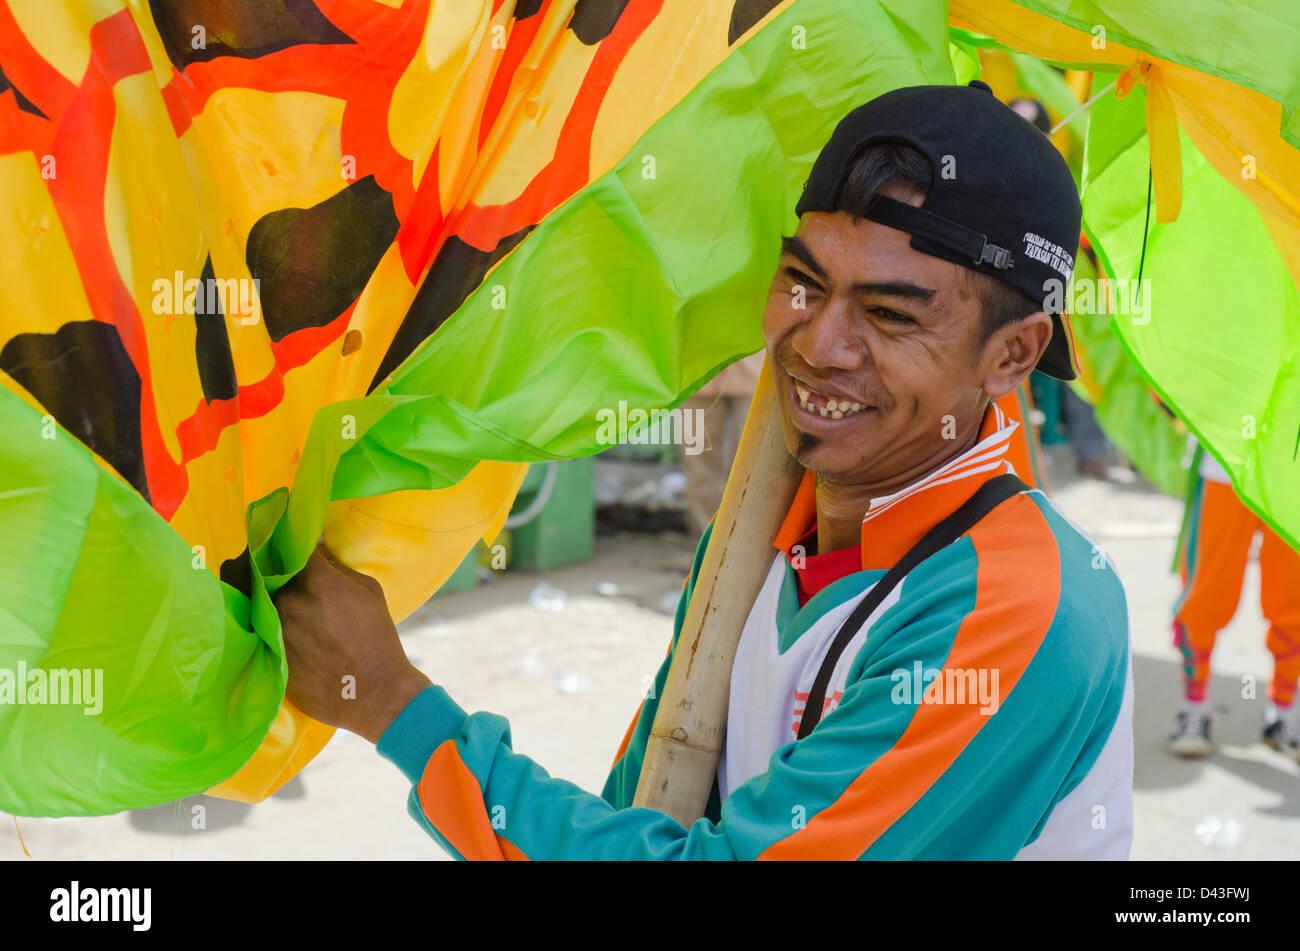 Indonesian man holding up dragon in Chinese New Year parade, Ketapang, West Kalimantan, Indonesia. - Stock Image